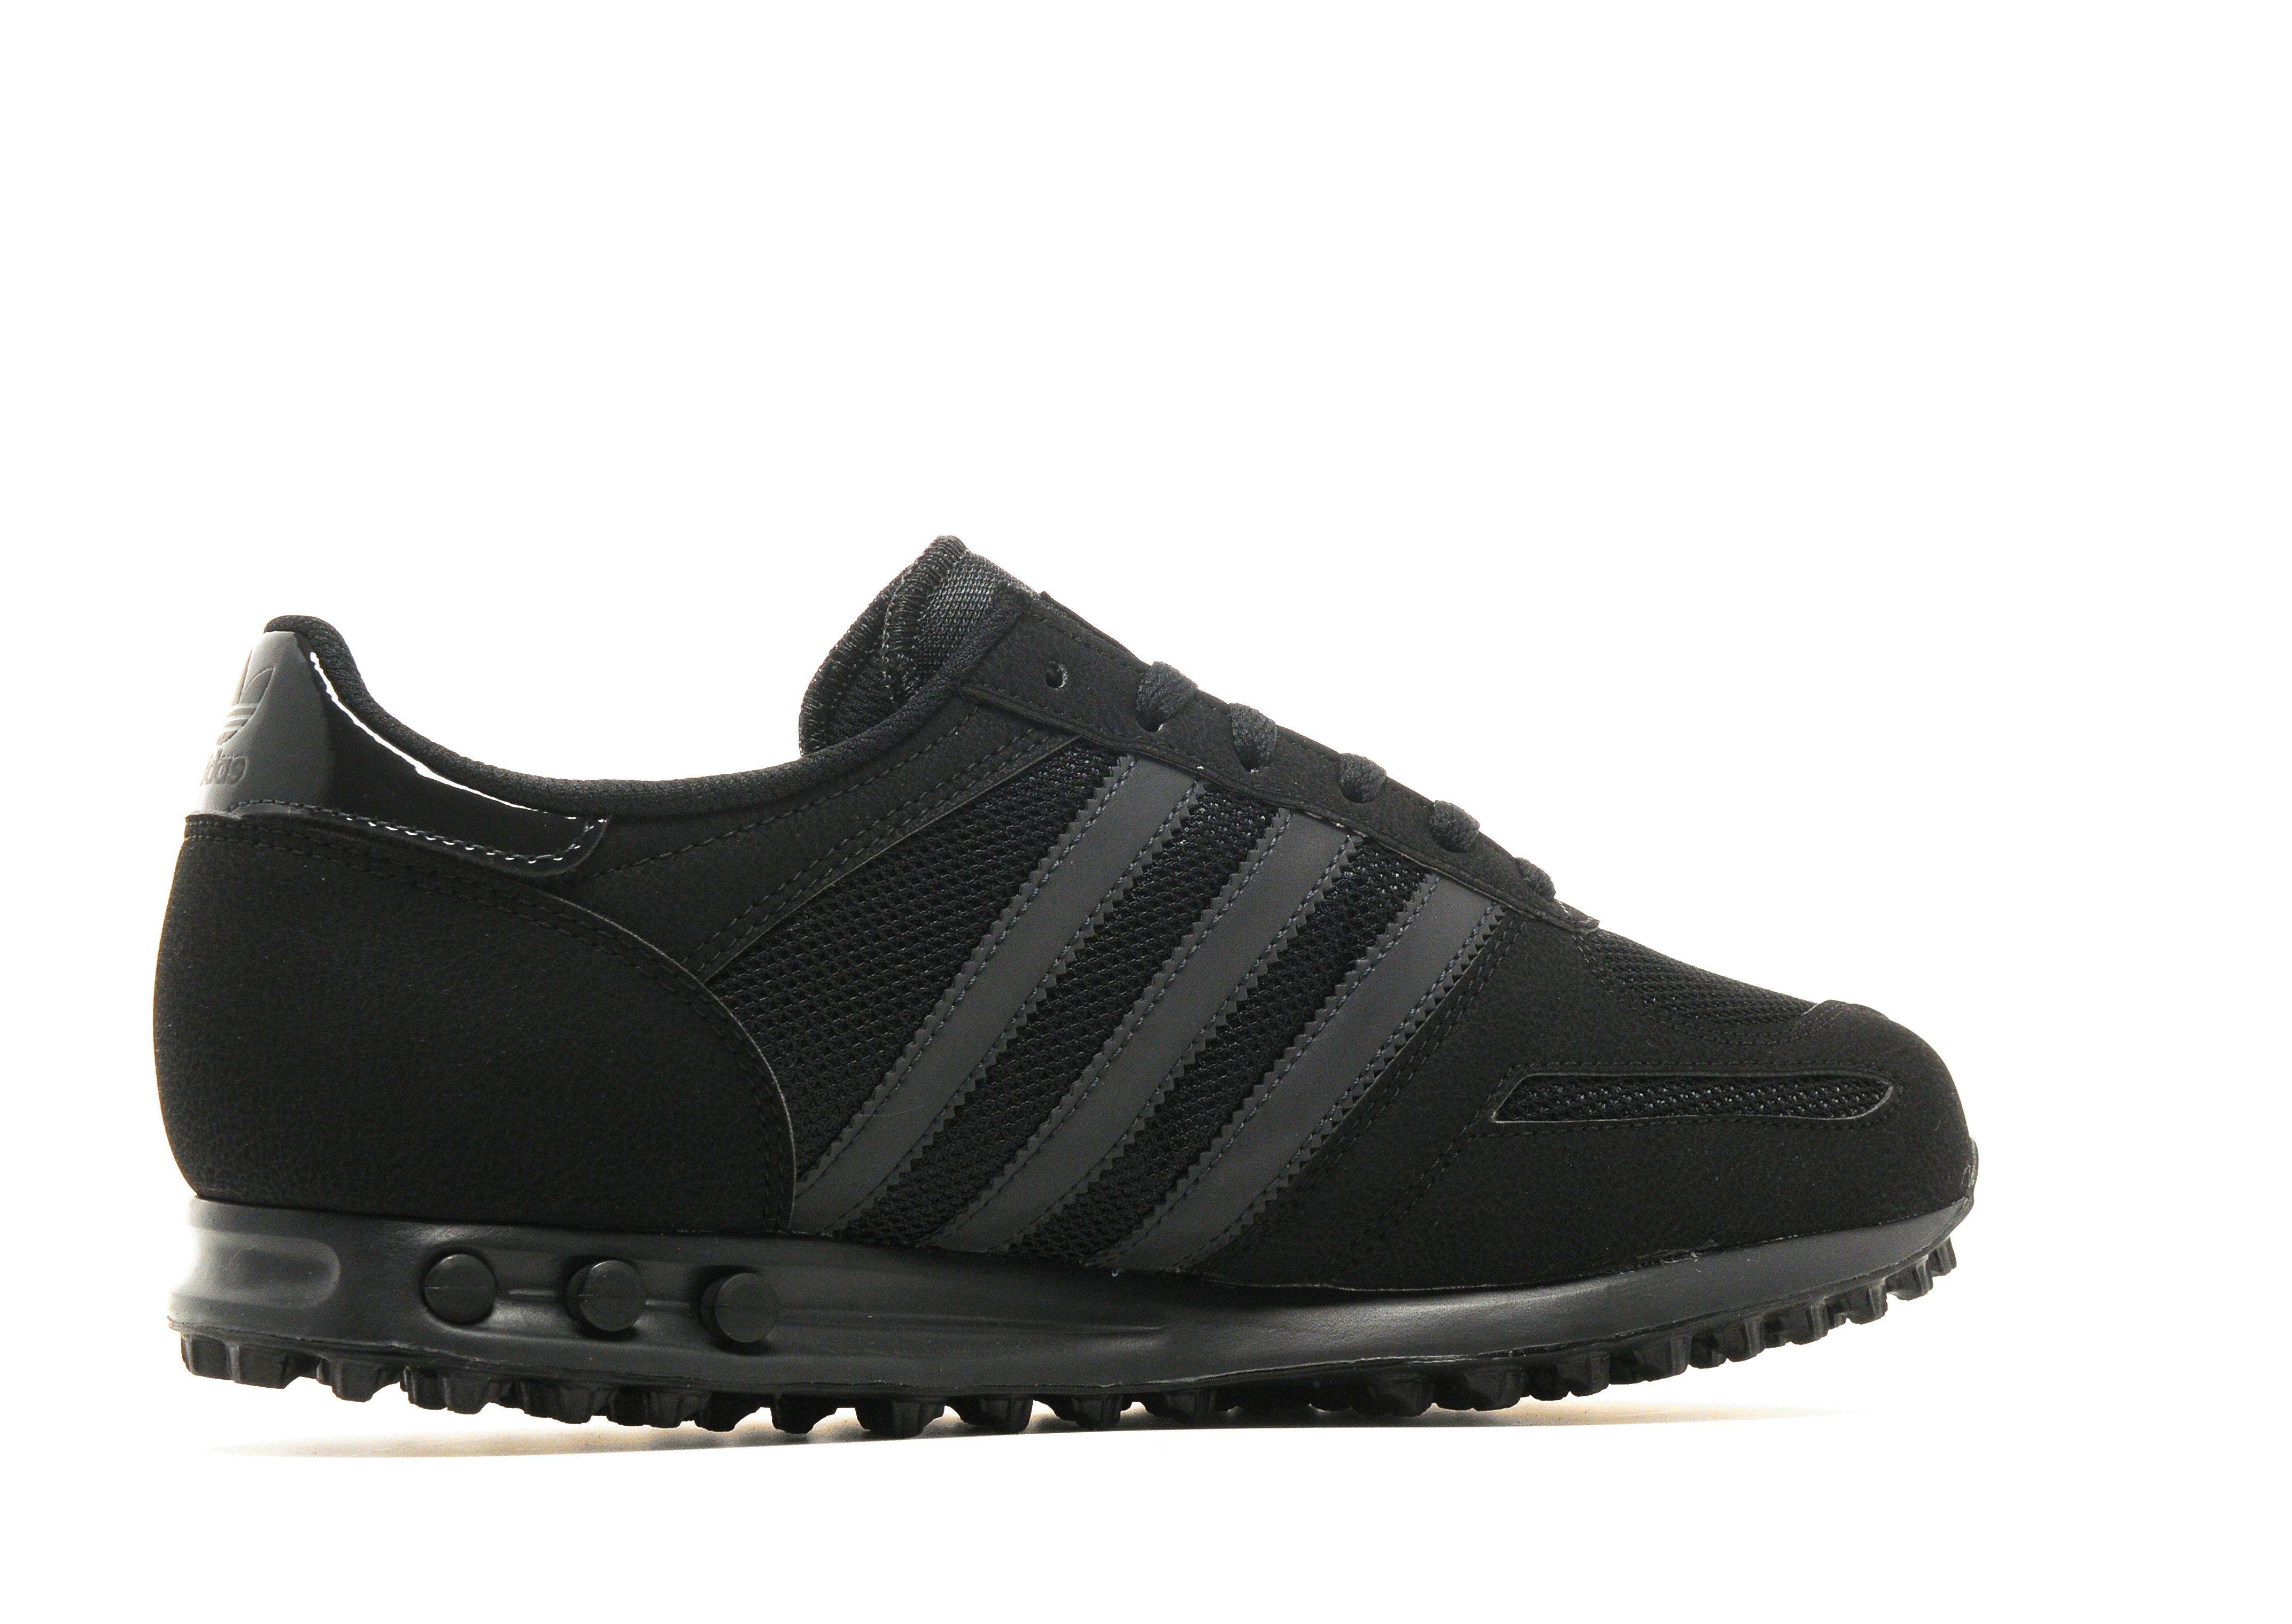 Adidas La Trainer Woven Midnightfashions Co Uk